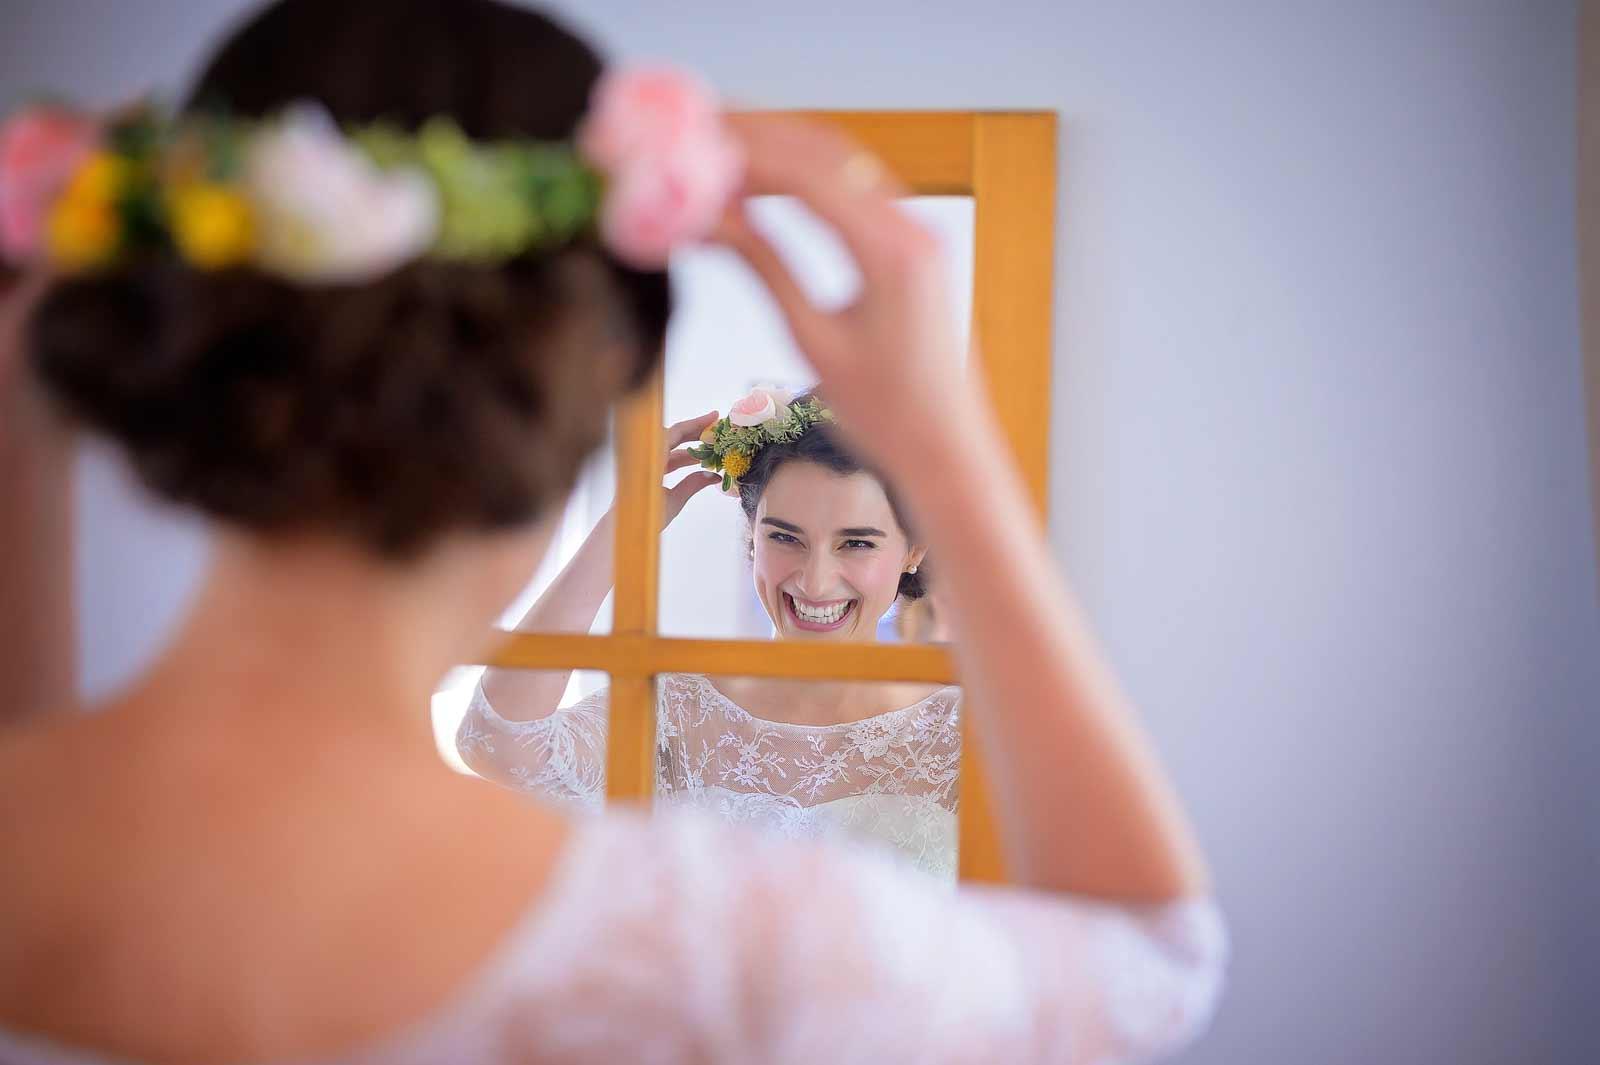 rebeccatrevor-wedding-sneakpeek-05